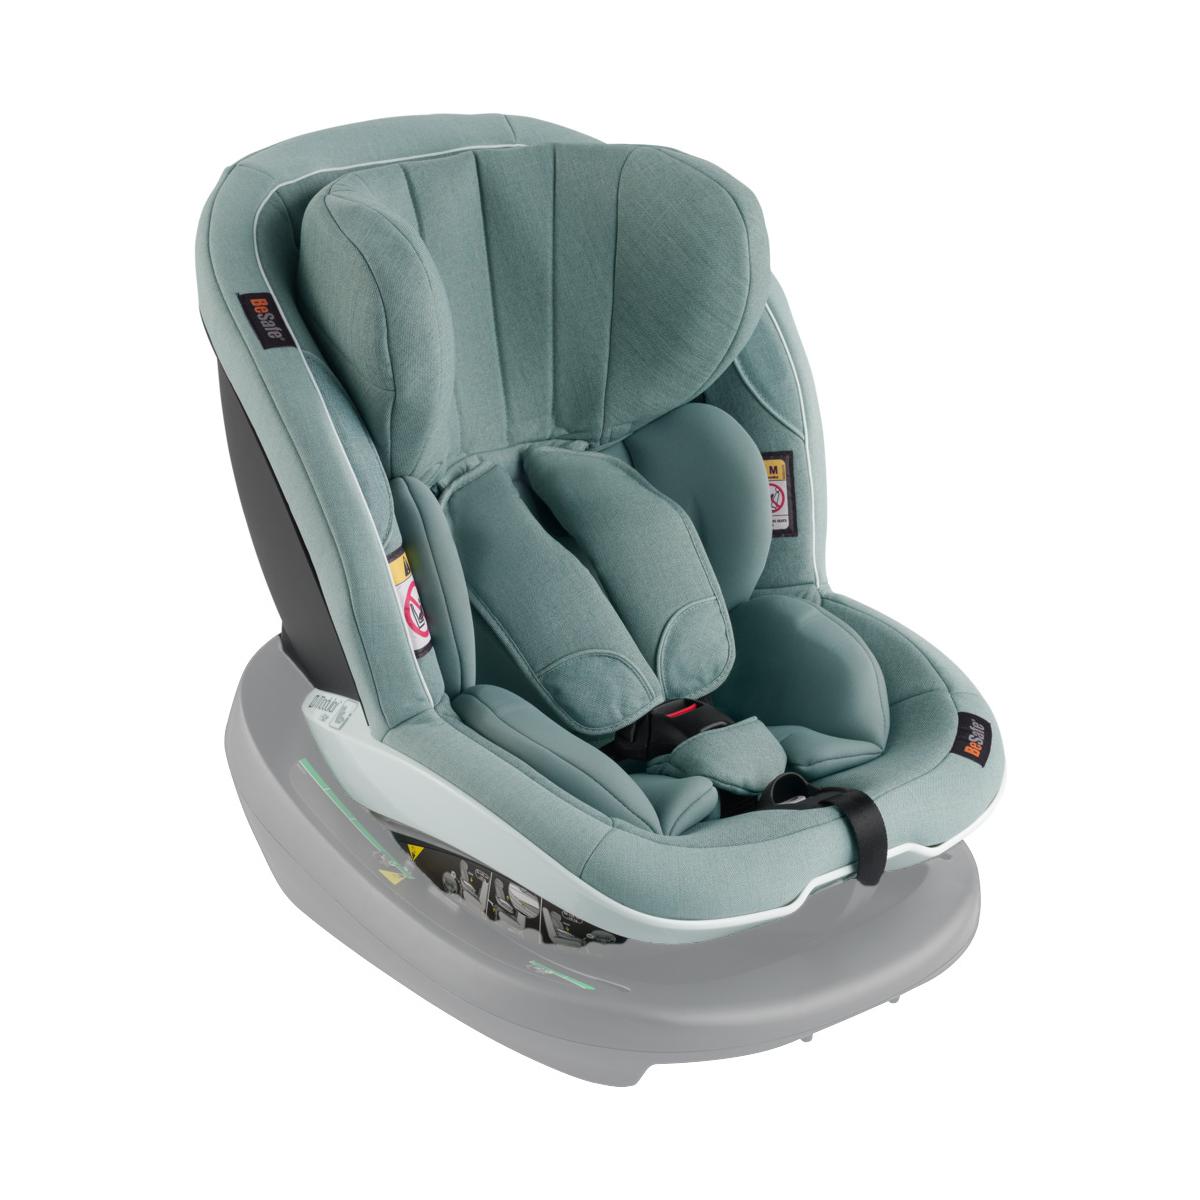 Kindersitz Ohne Isofix